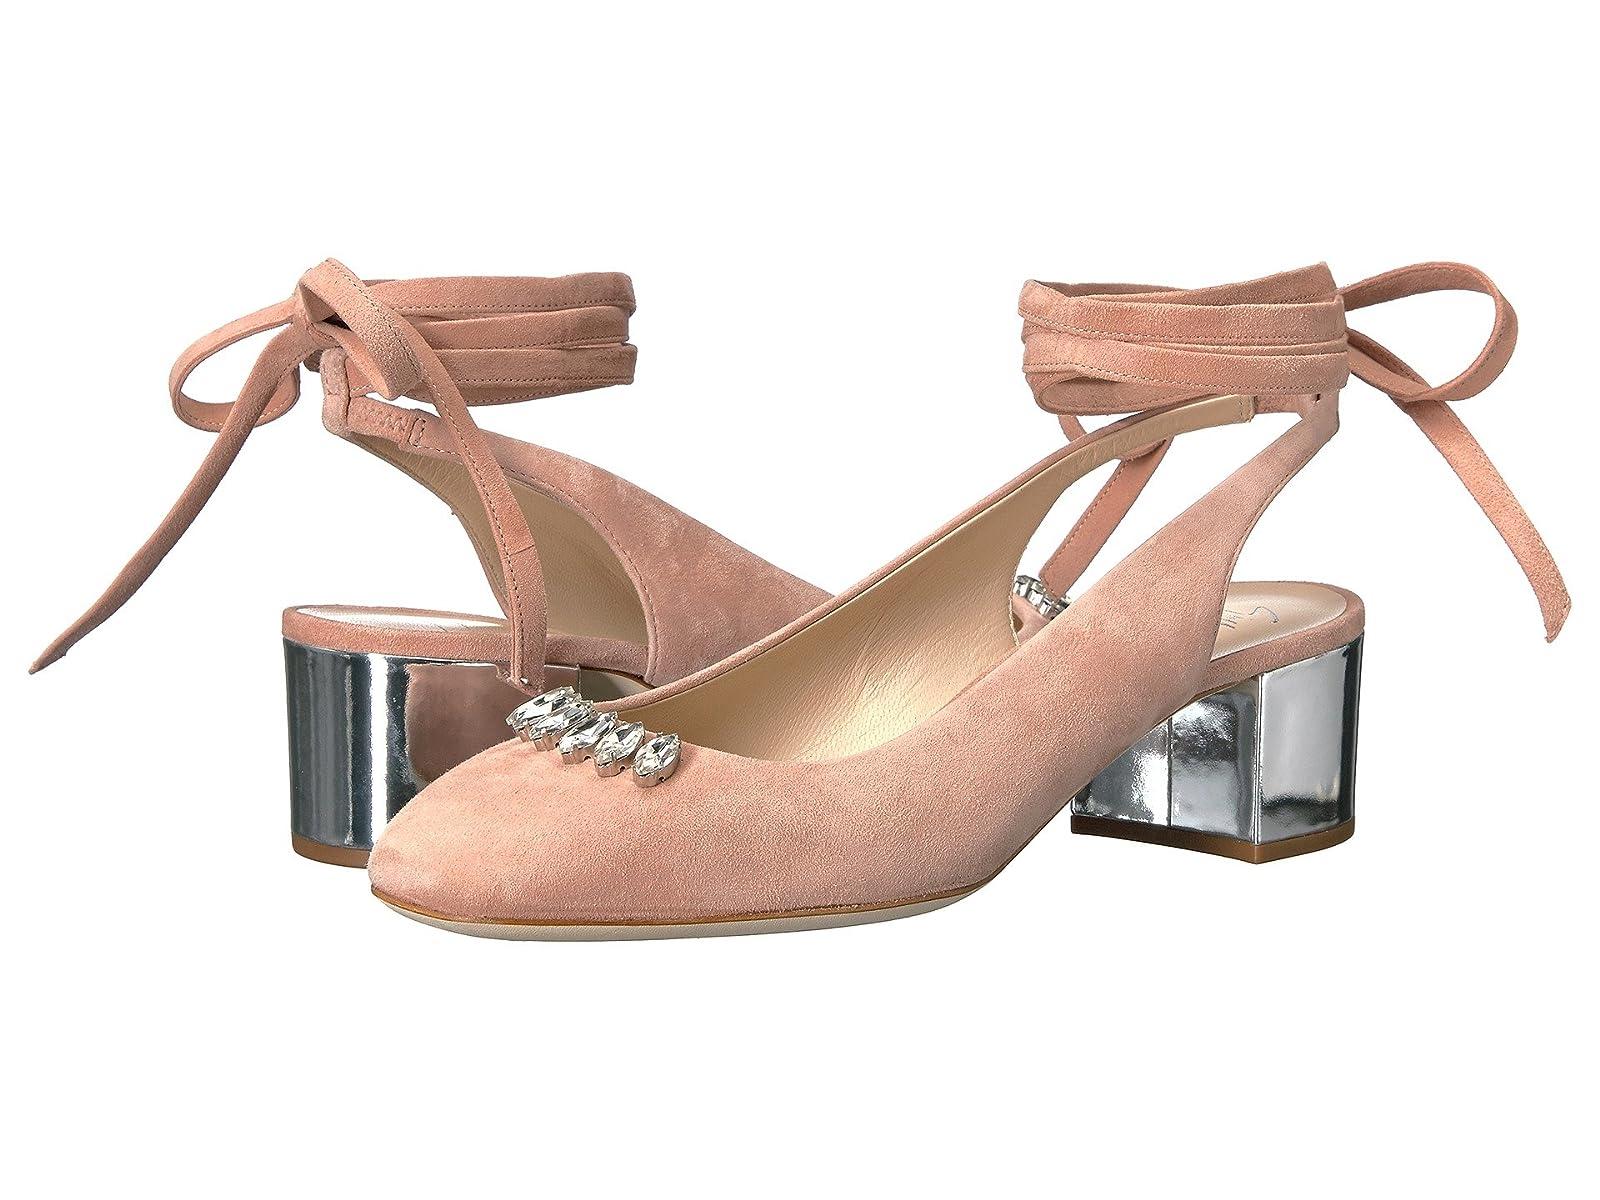 Giuseppe Zanotti E76080Cheap and distinctive eye-catching shoes